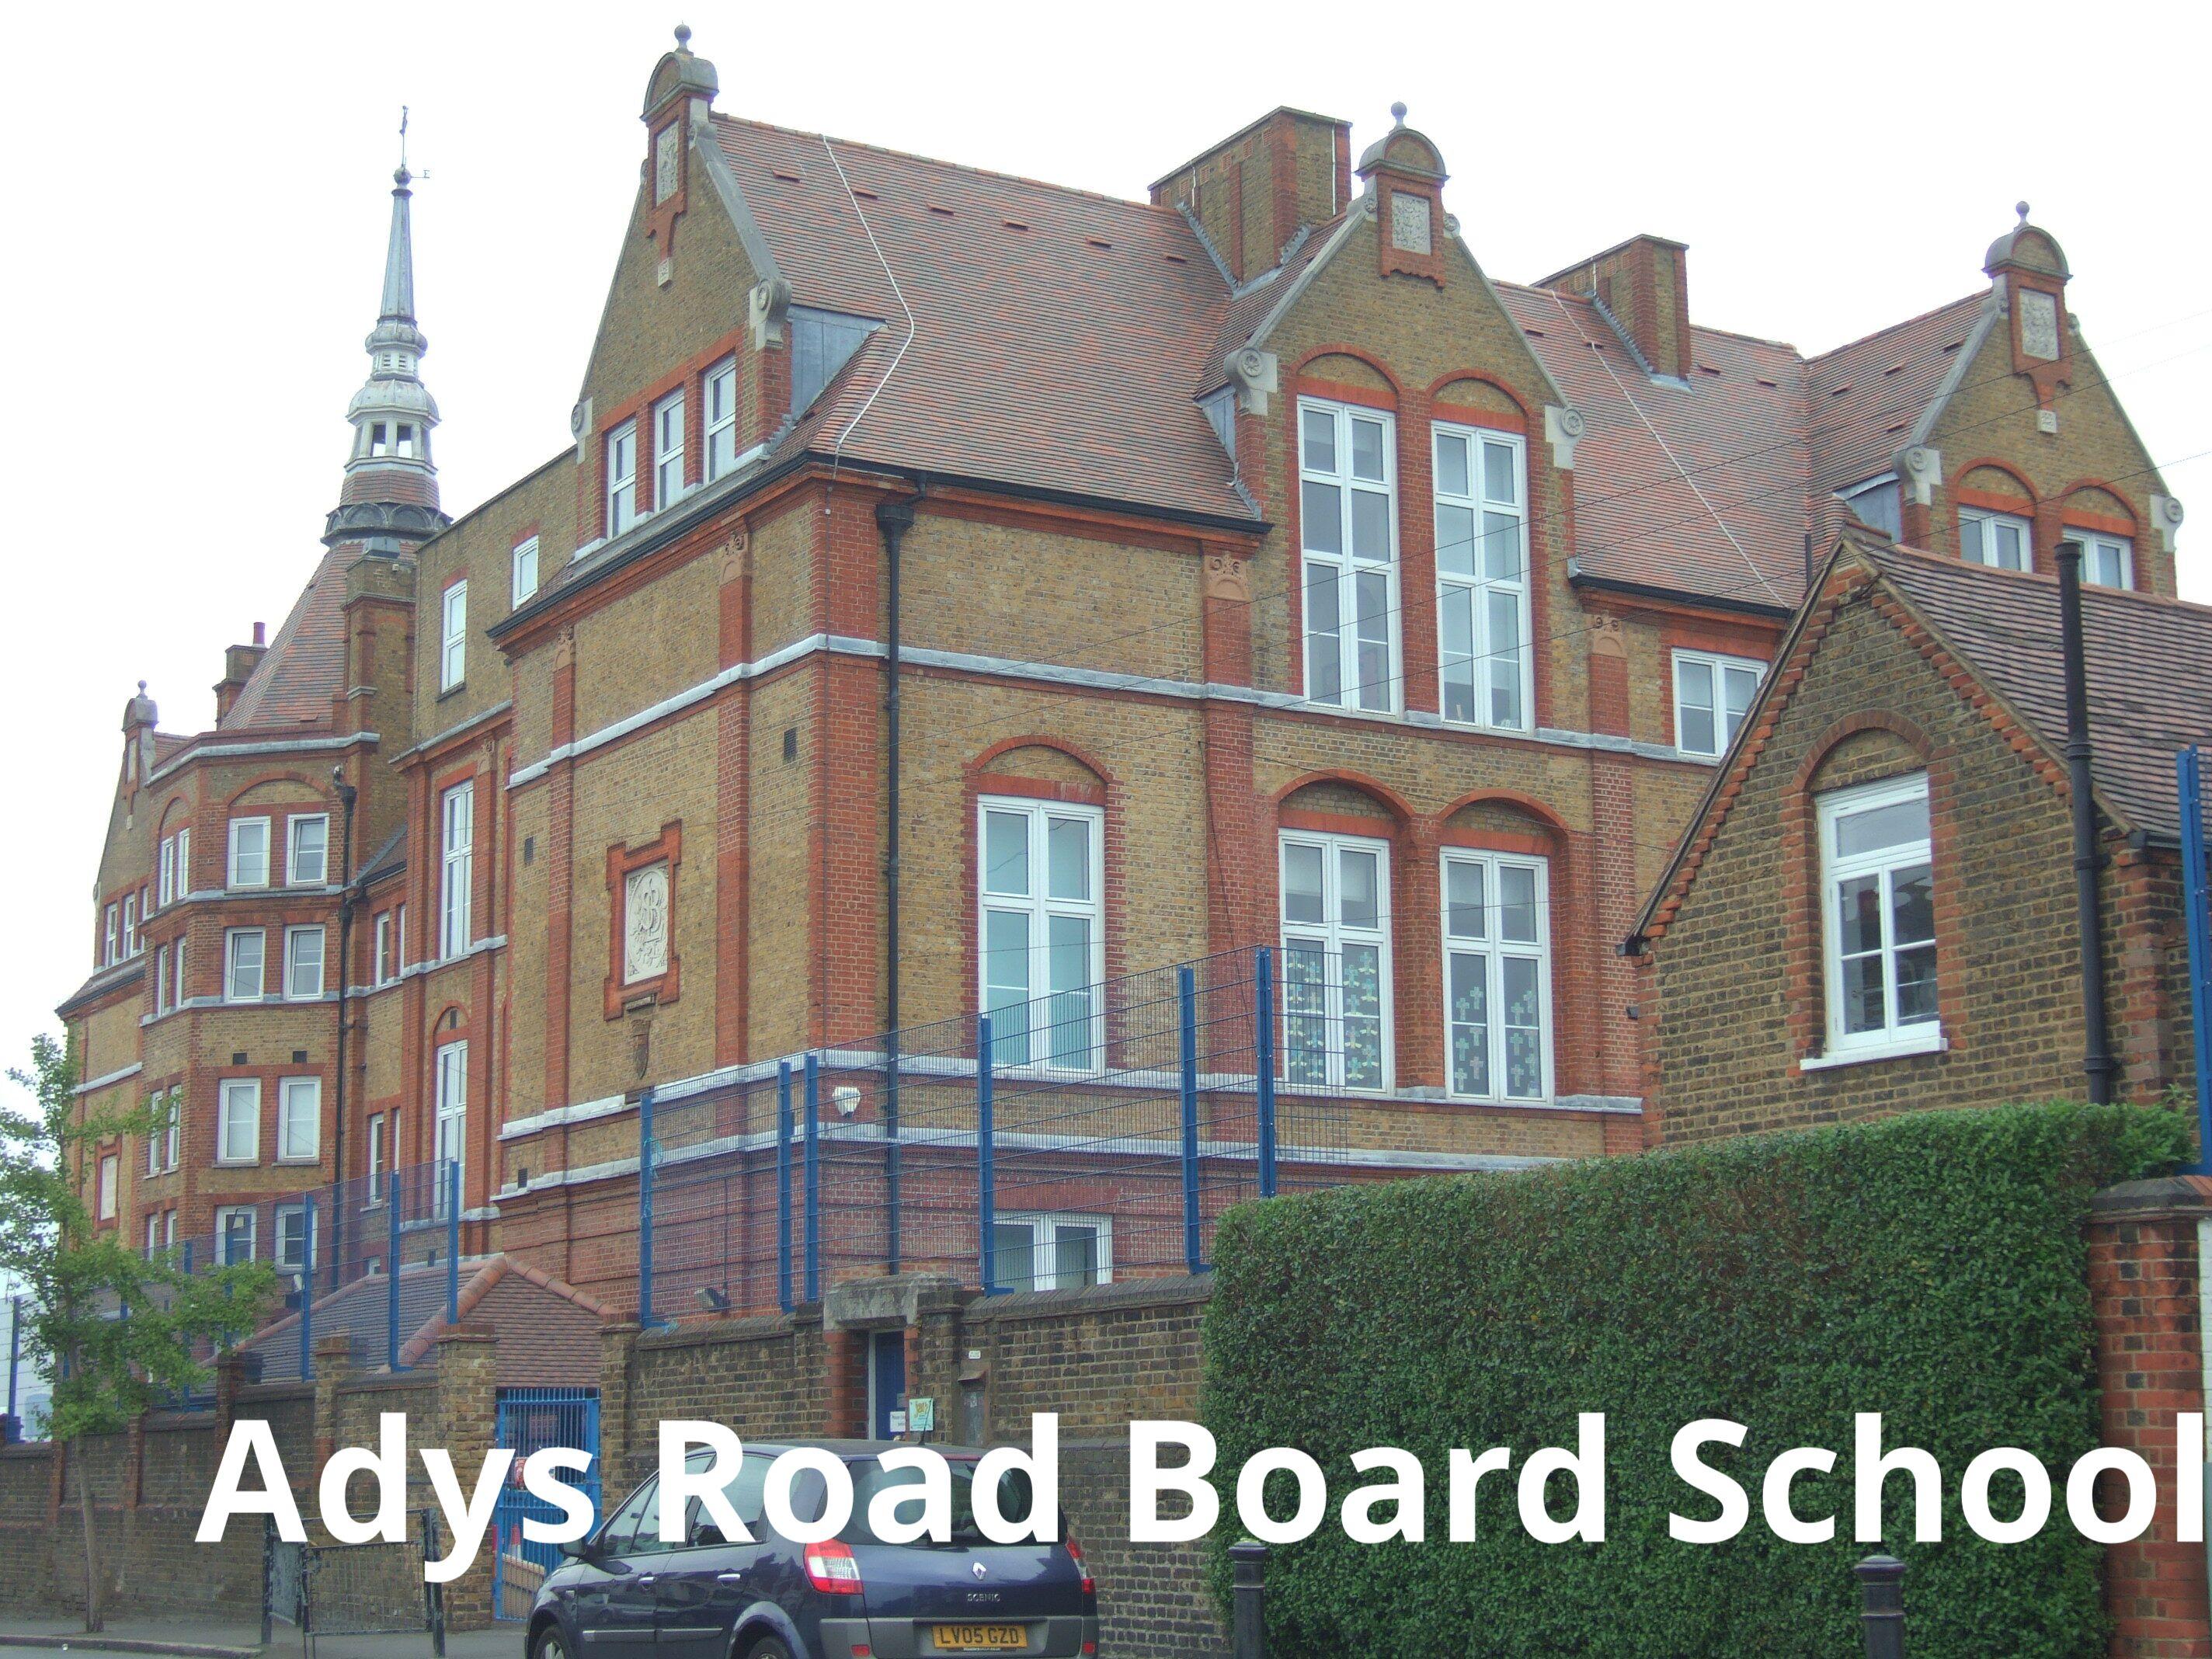 Photo of Adys Road Board School